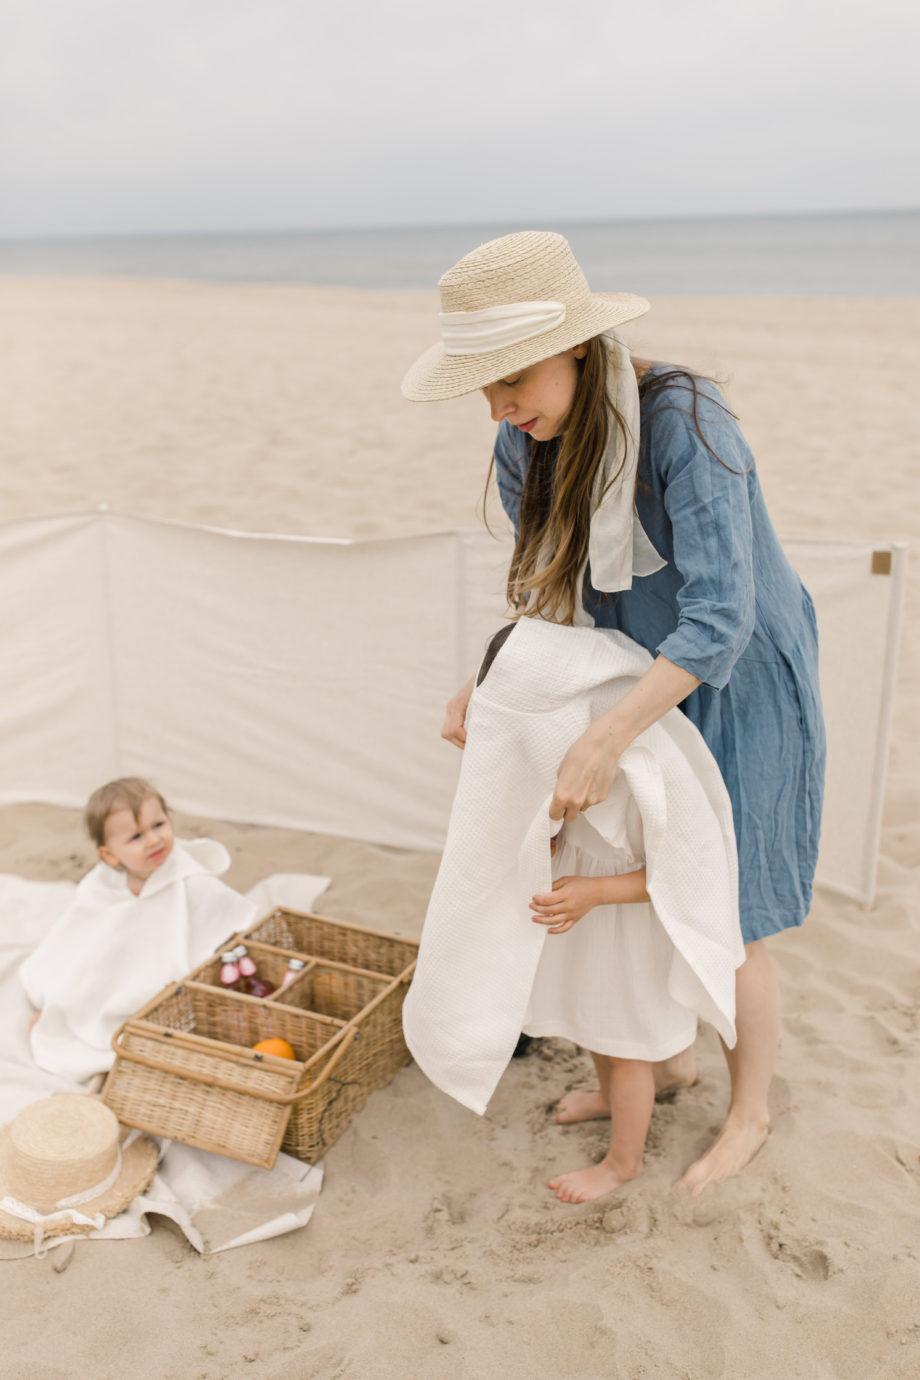 linen beach towel, kids poncho towel, linen poncho towel for kids